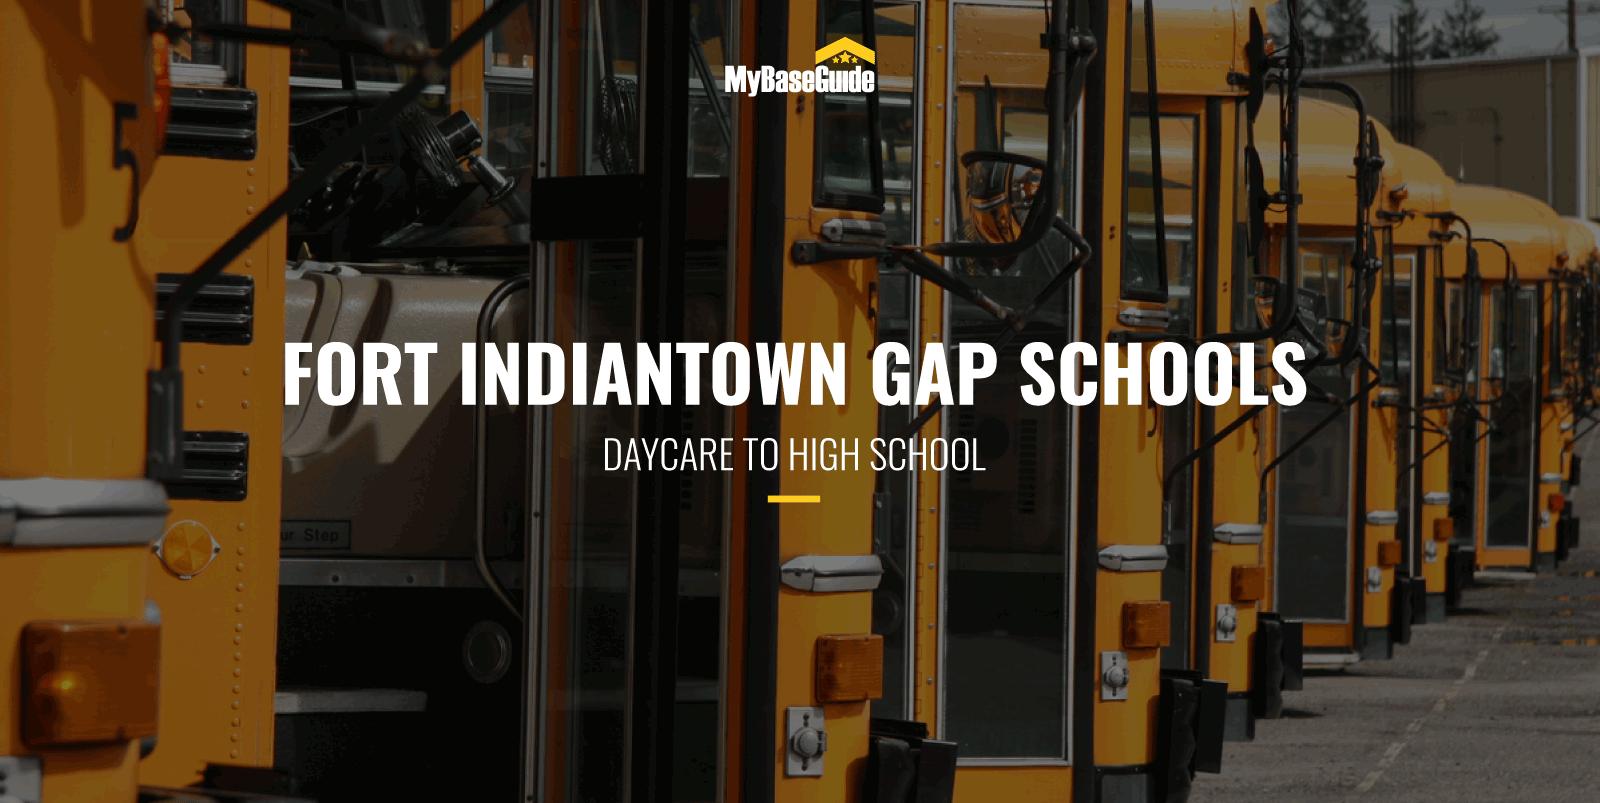 Fort Indiantown Gap Schools: Daycare - High School